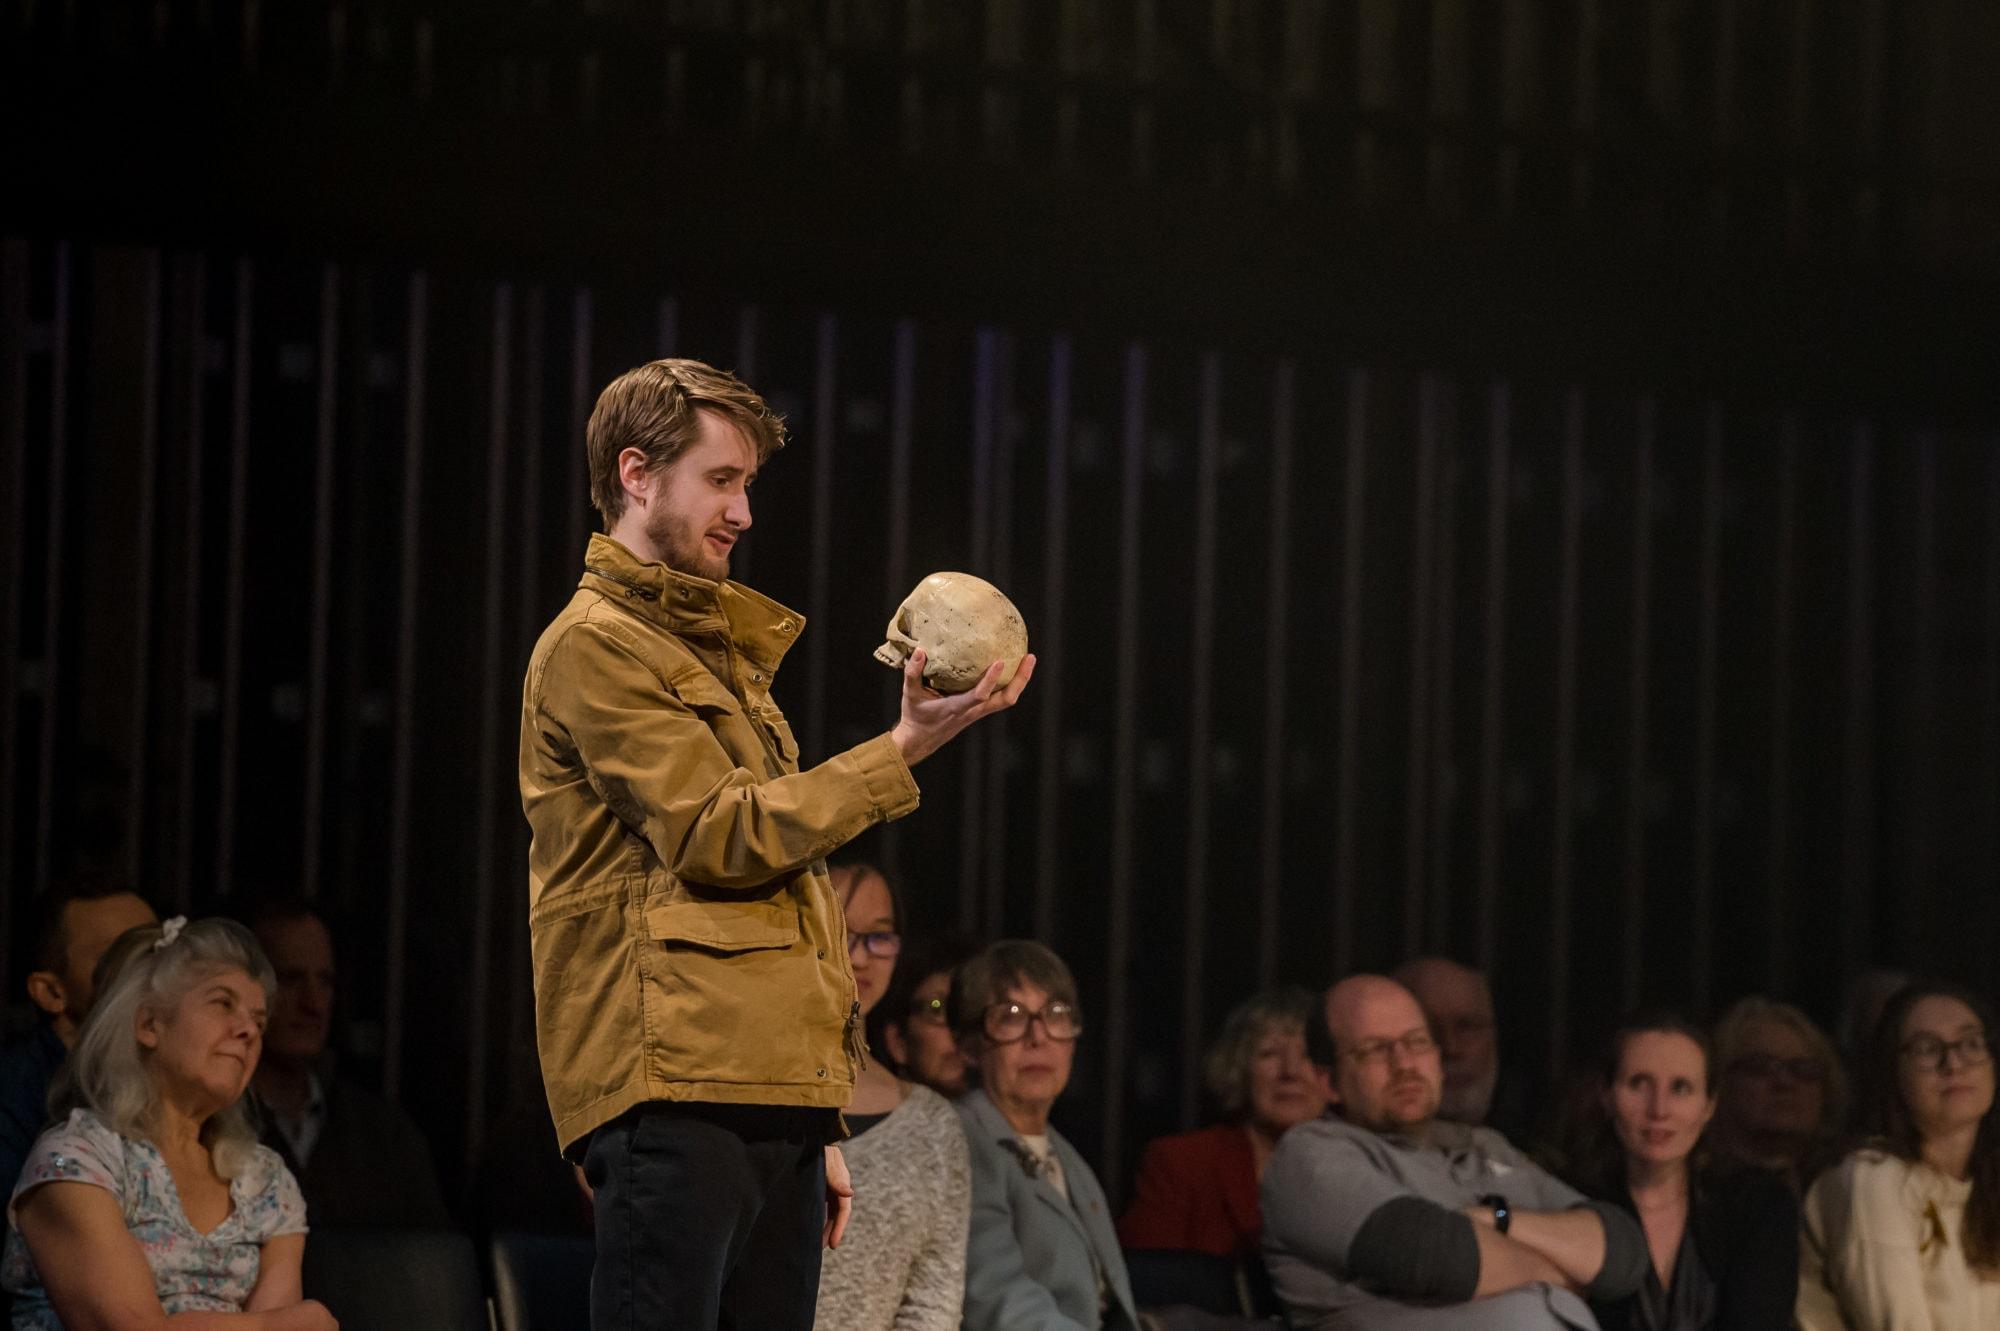 Aubie Merrylees as Hamlet. Photo by Randall Garnick Photography.